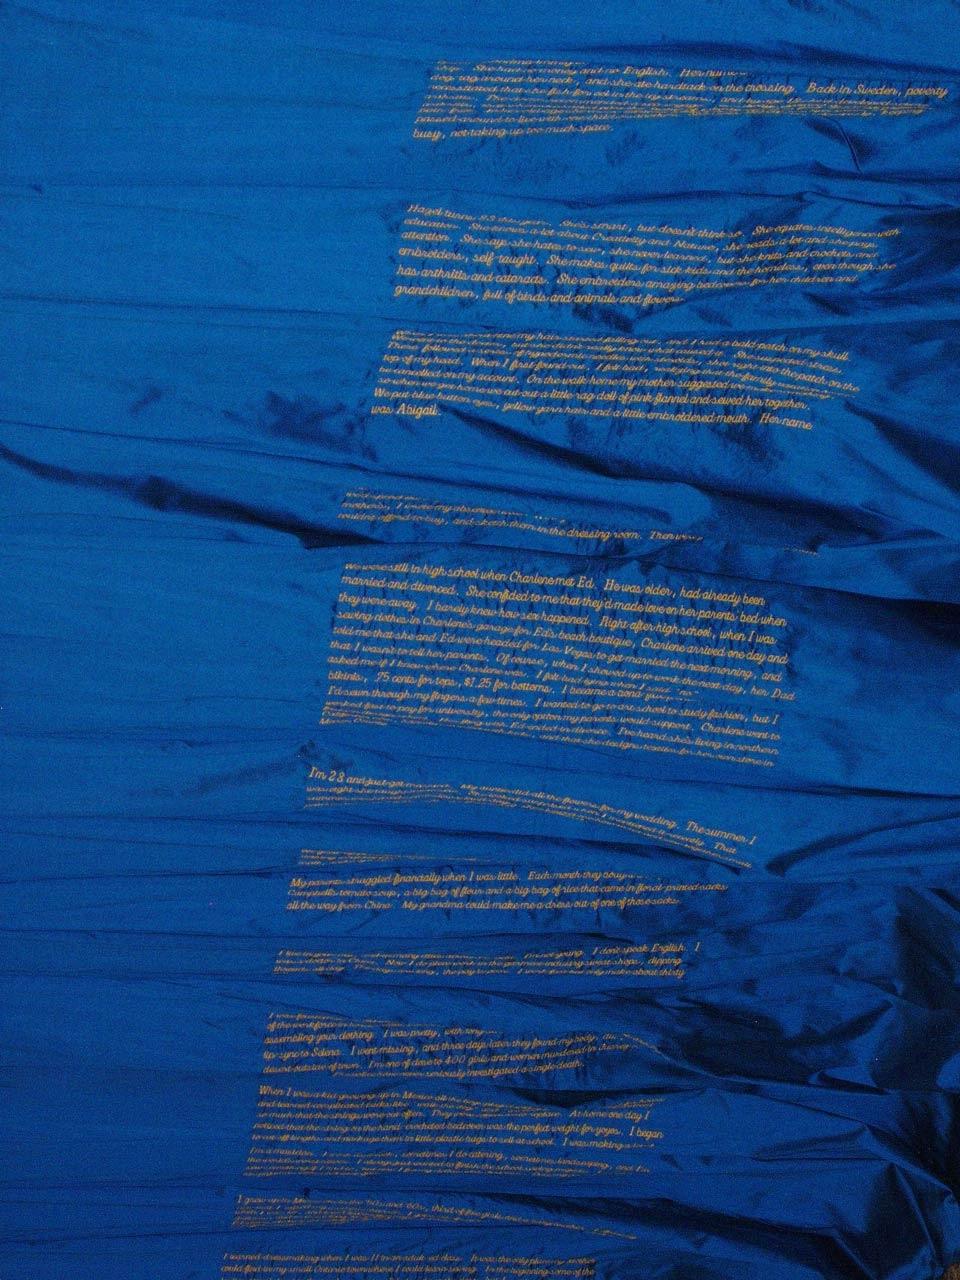 Deborah-Koenker-Visual-Artist-Vancouver_Textile-Art_Bluebird